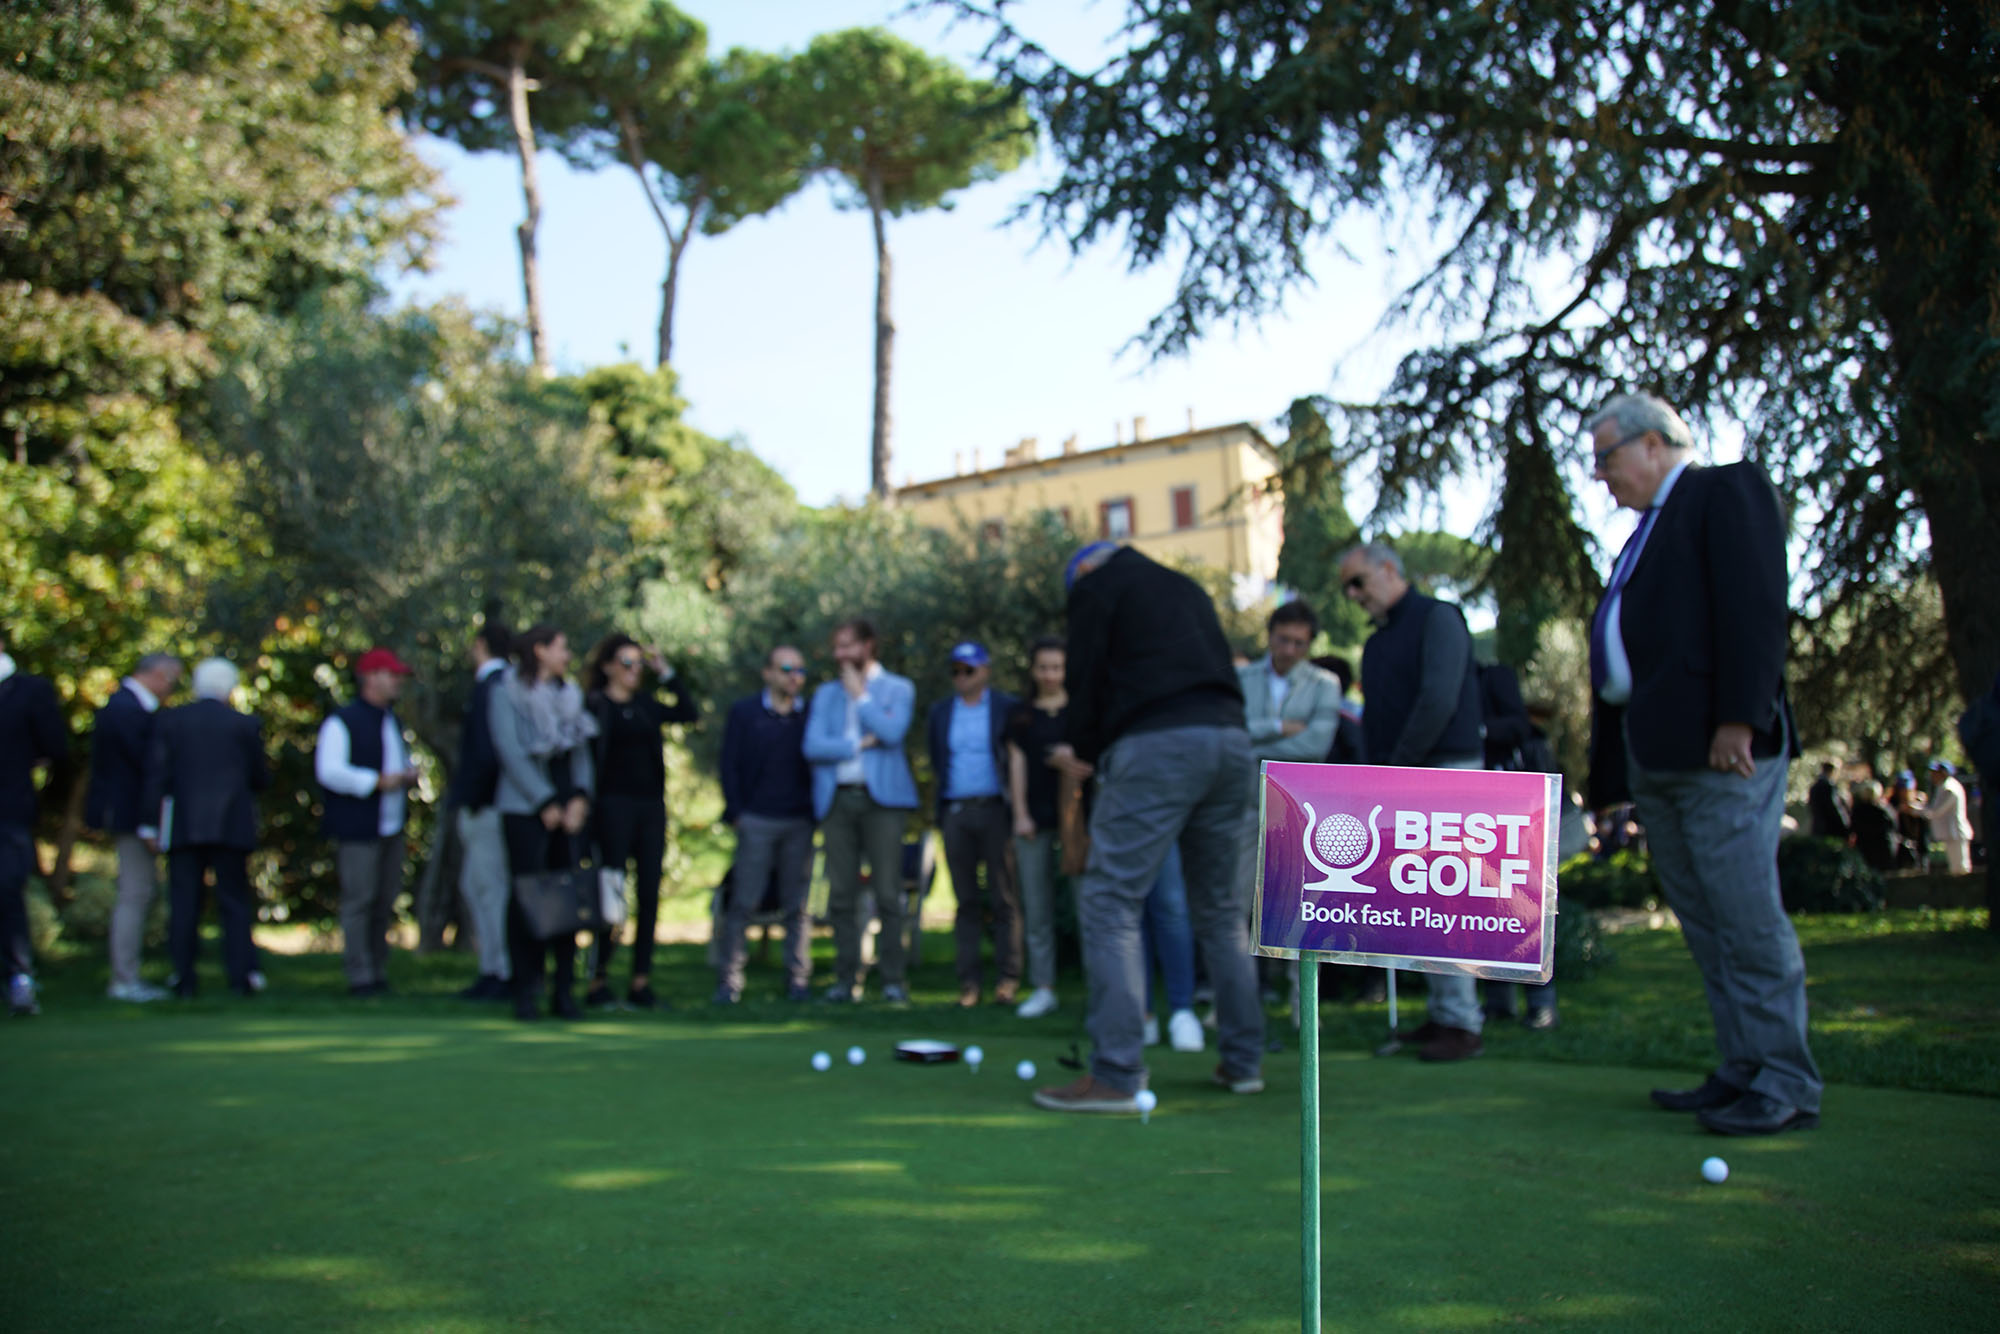 z-Best-Golf-Day-Travel-MeetingDSC02441